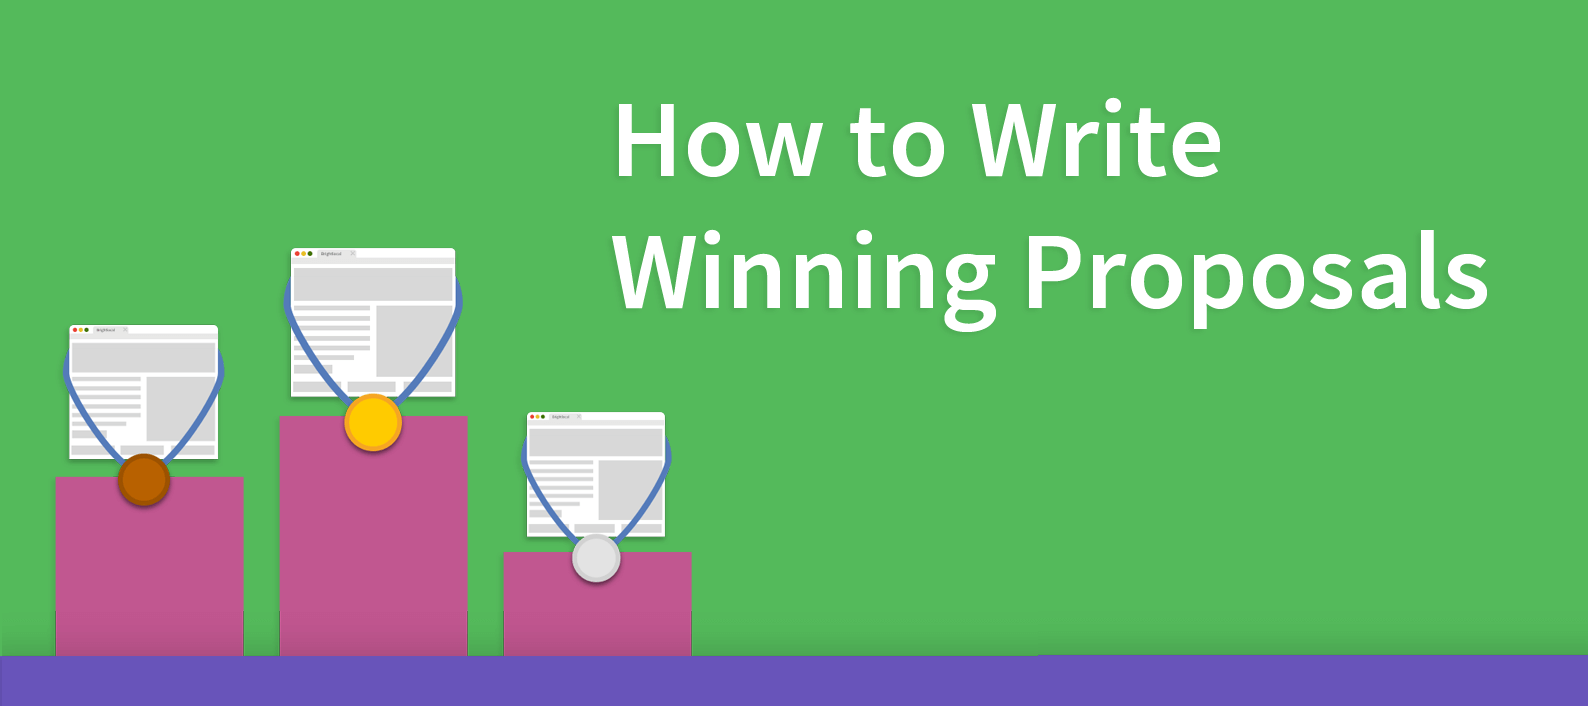 Write Winning Proposals